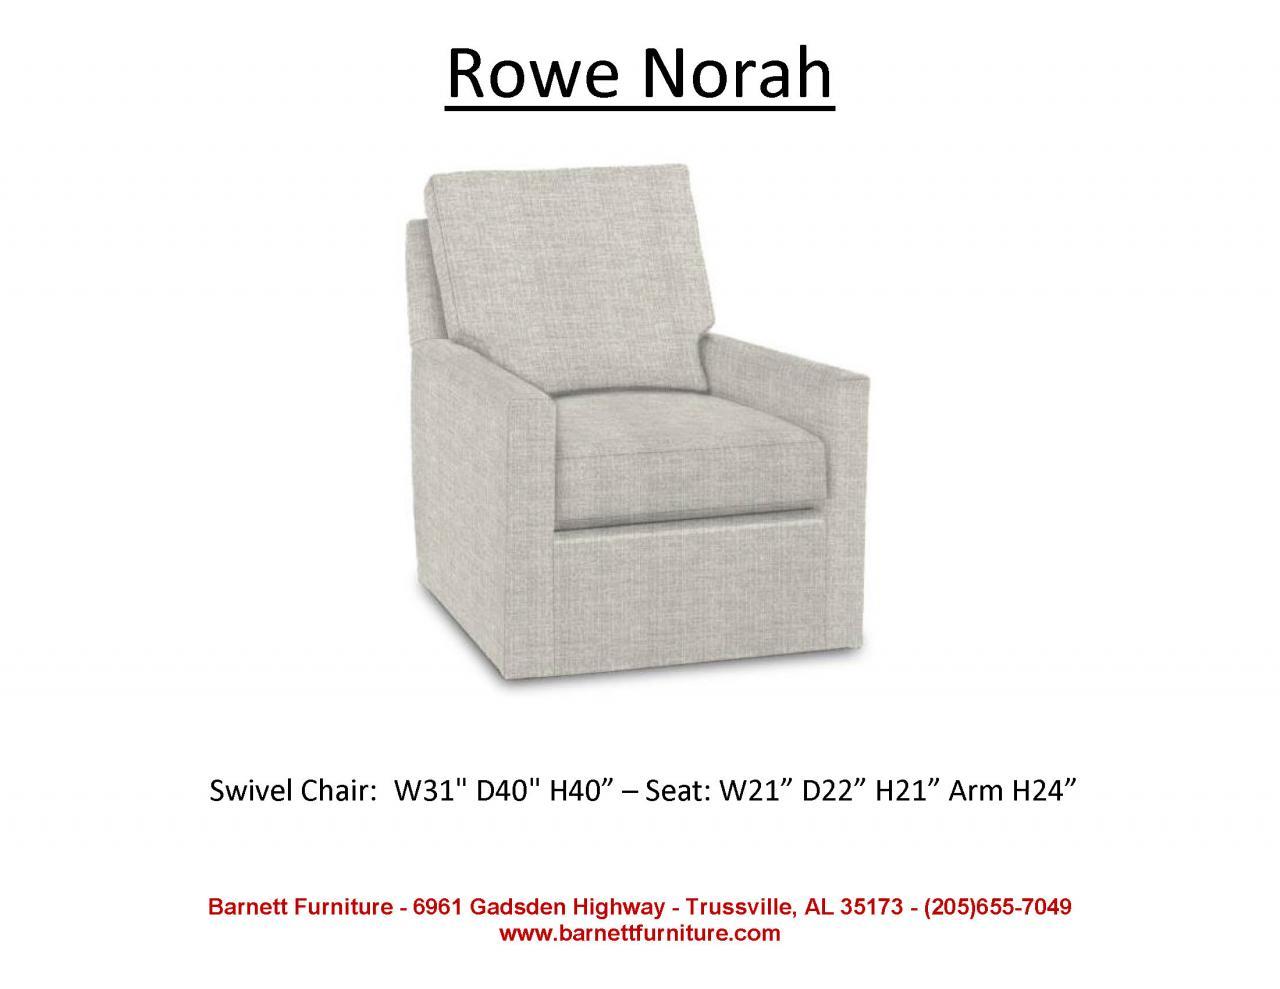 ... Rowe Norah Upholstered Swivel Chair ...